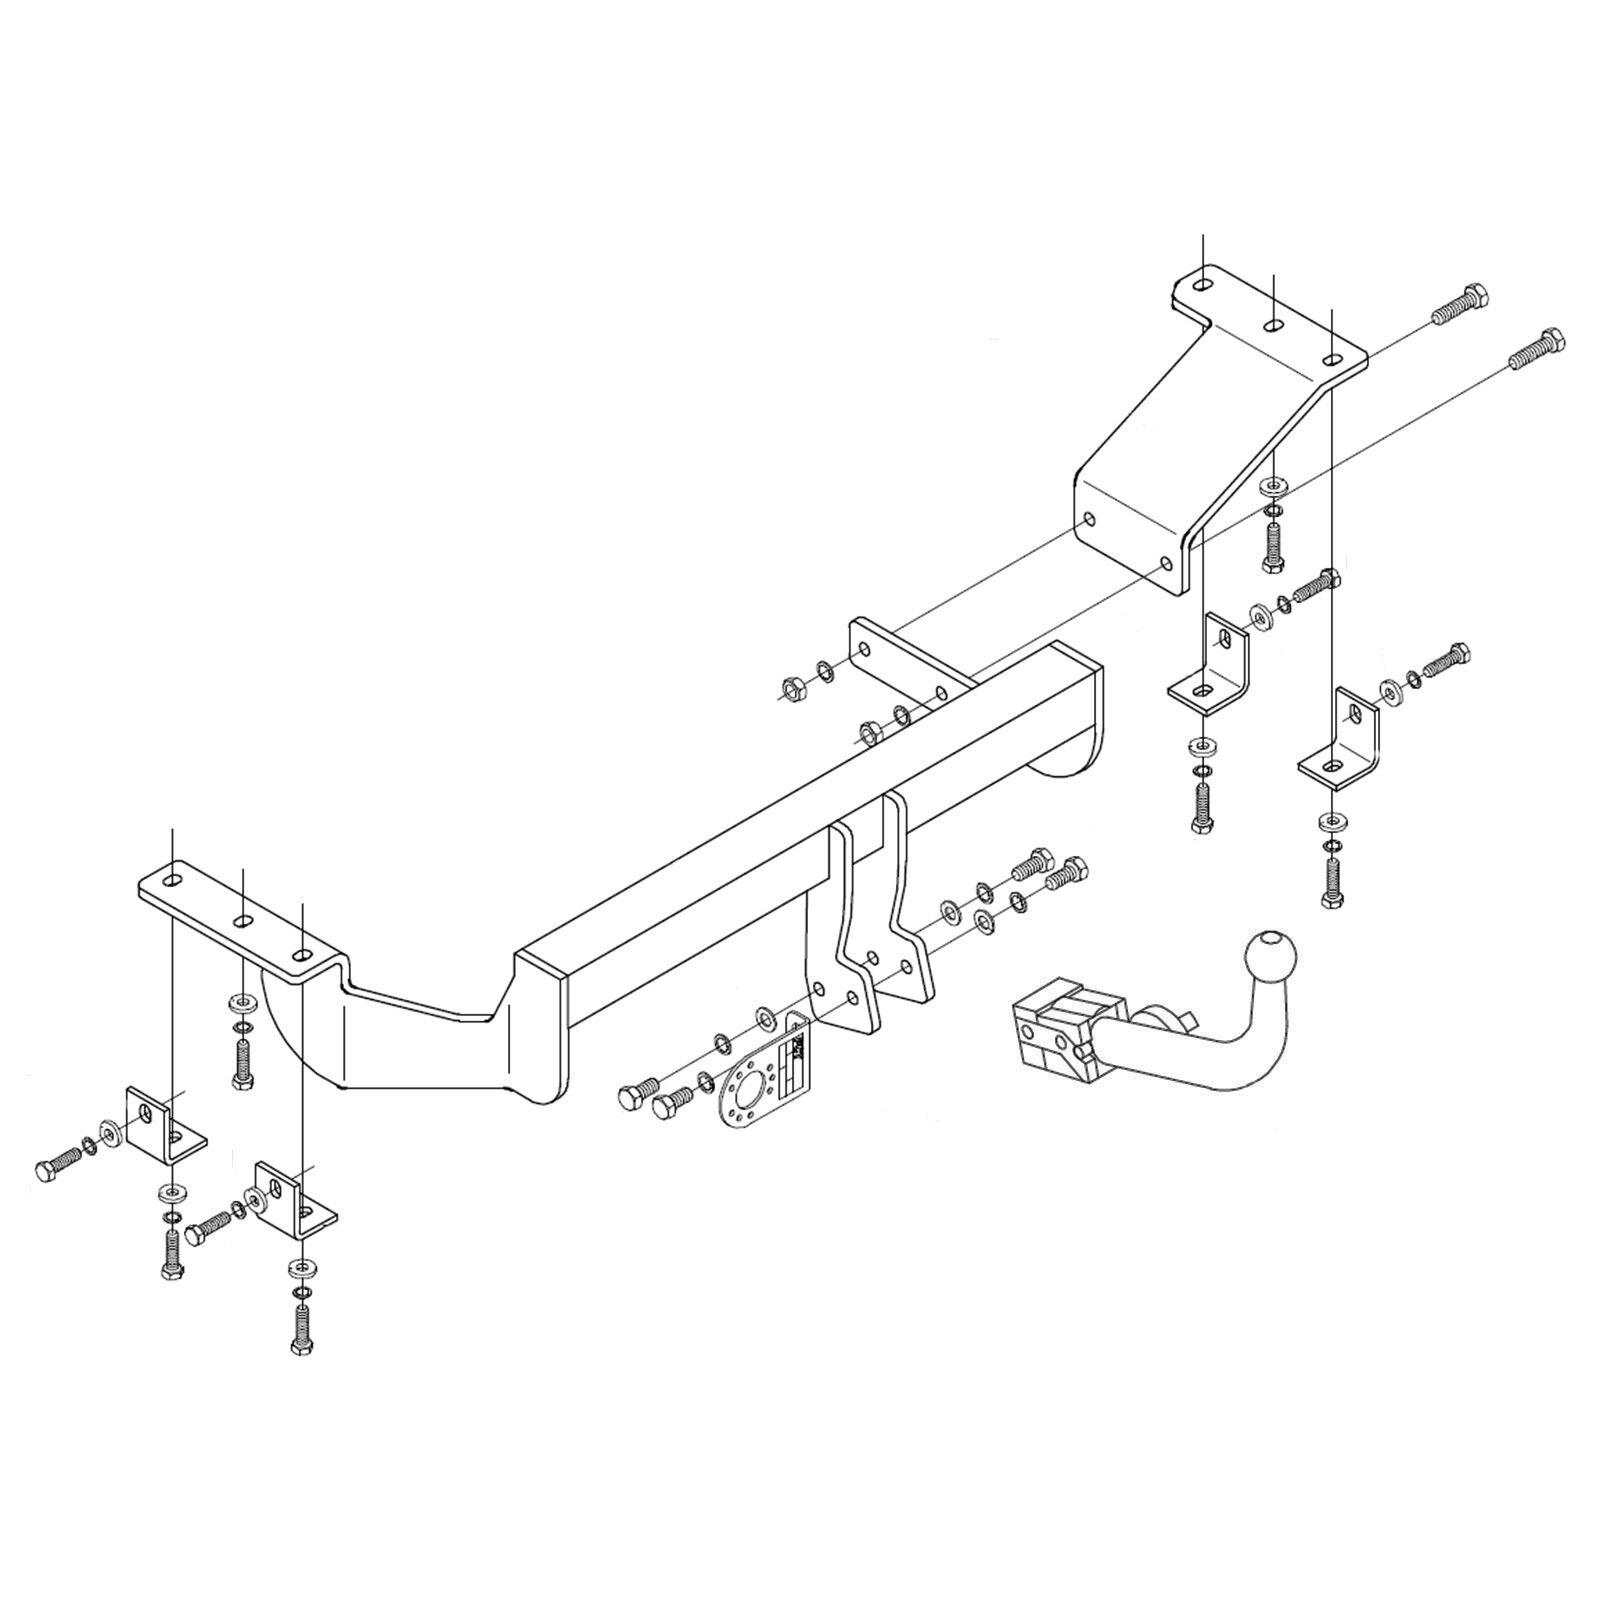 Fixed Swan Neck Towbar for CITROEN C-CROSSER 2007-2013